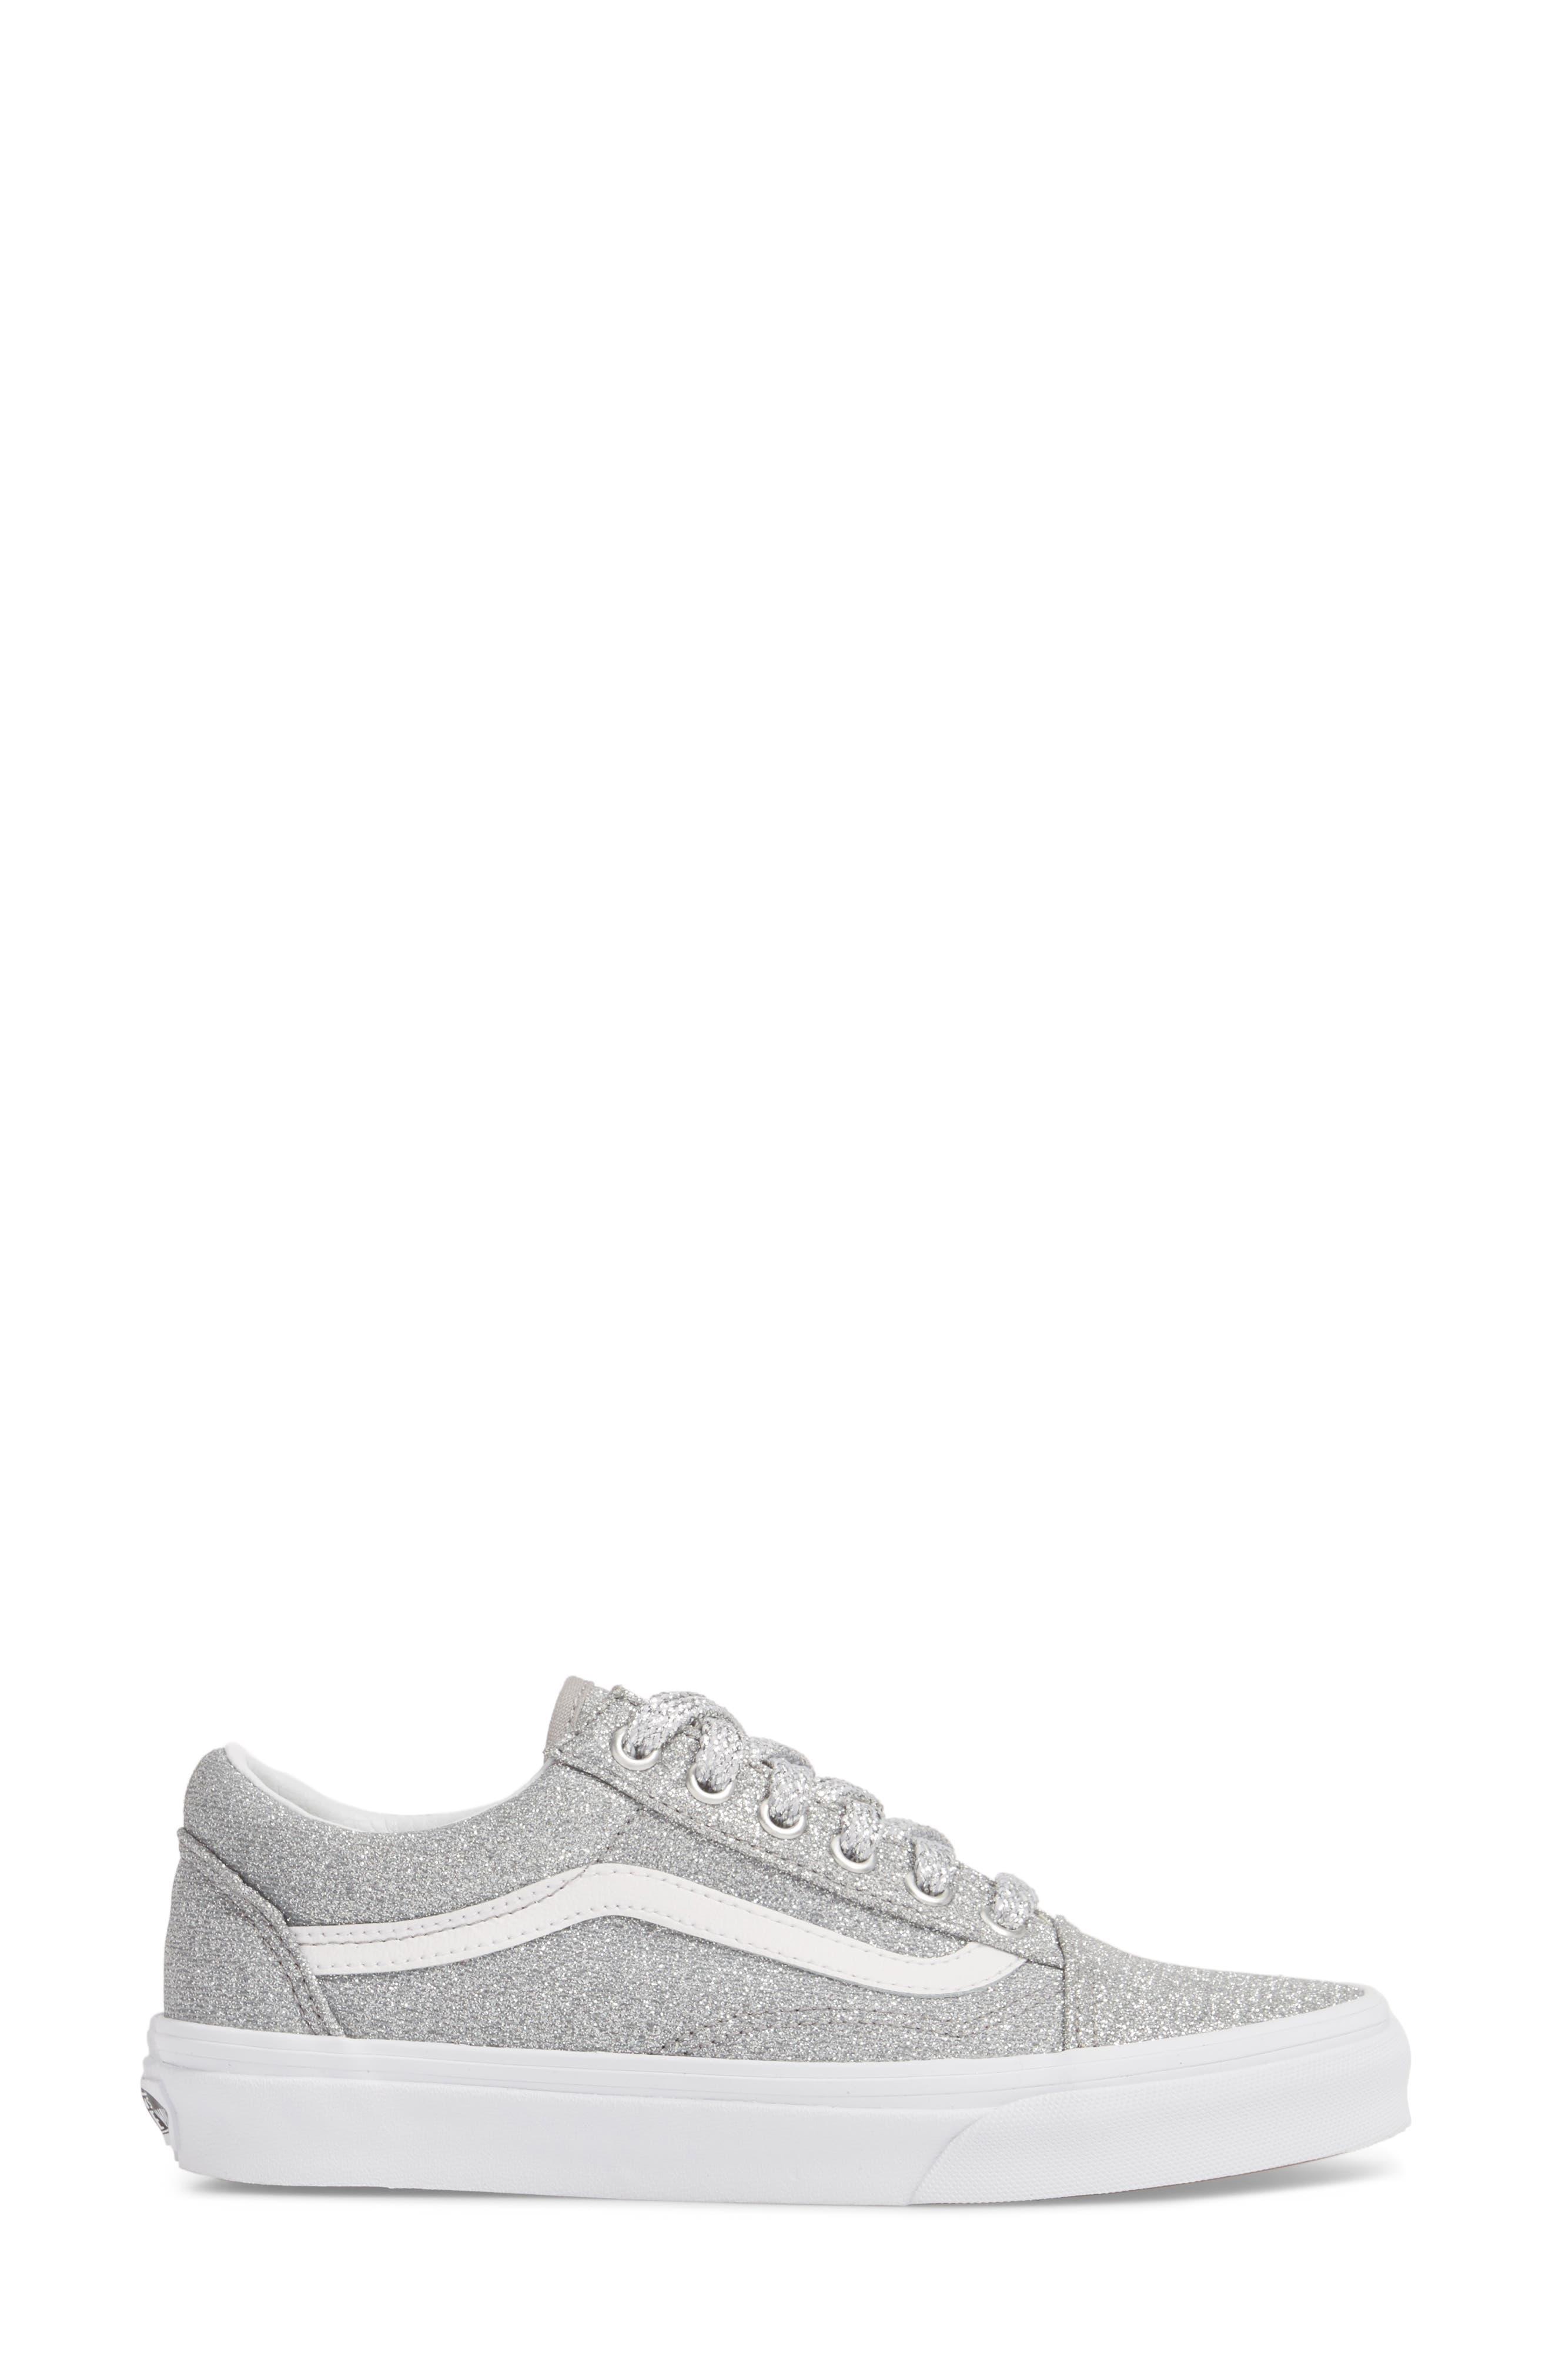 UA Old Skool Glitter Low Top Sneaker,                             Alternate thumbnail 3, color,                             SILVER/ TRUE WHITE GLITTER